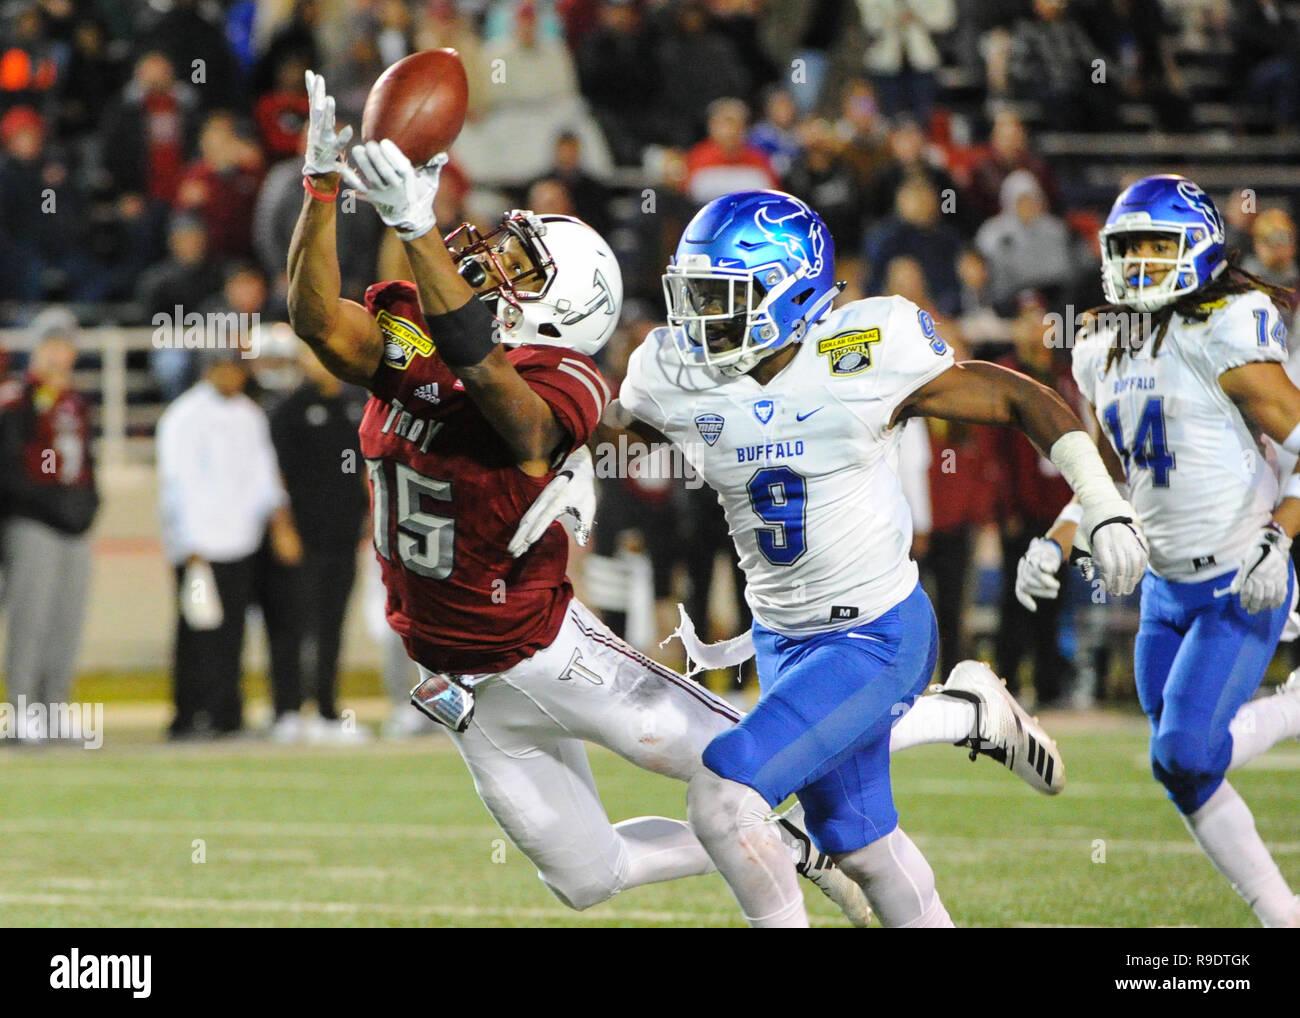 Mobile, AL, USA  22nd Dec, 2018  Troy wide receiver, Damion